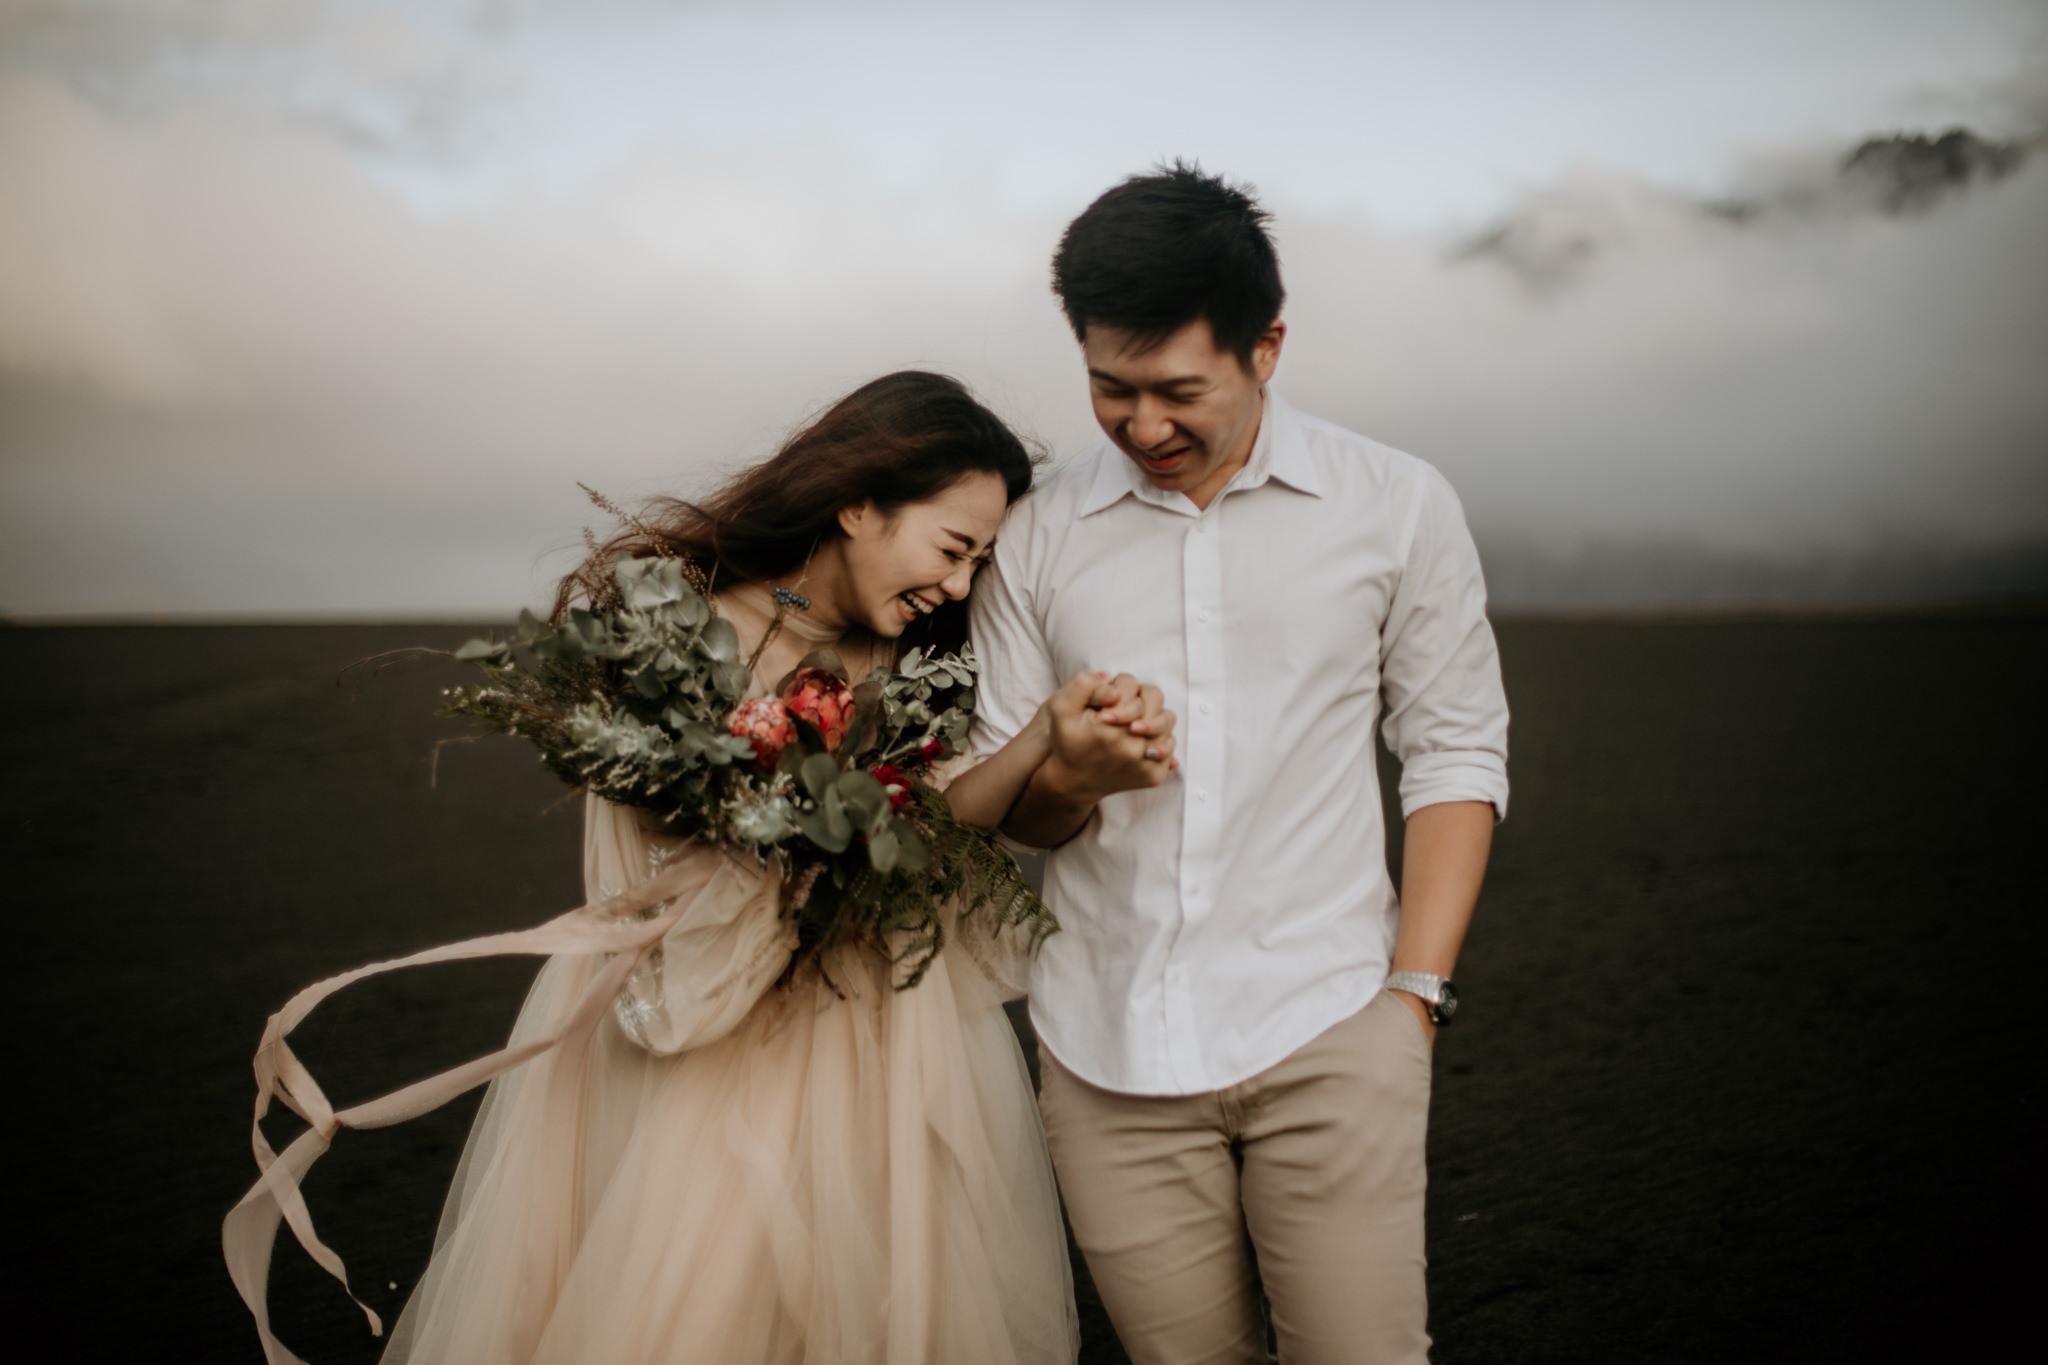 bromo_elopement_photographer_christineadel_weddingphotography_romantic_indonesia (3).JPG